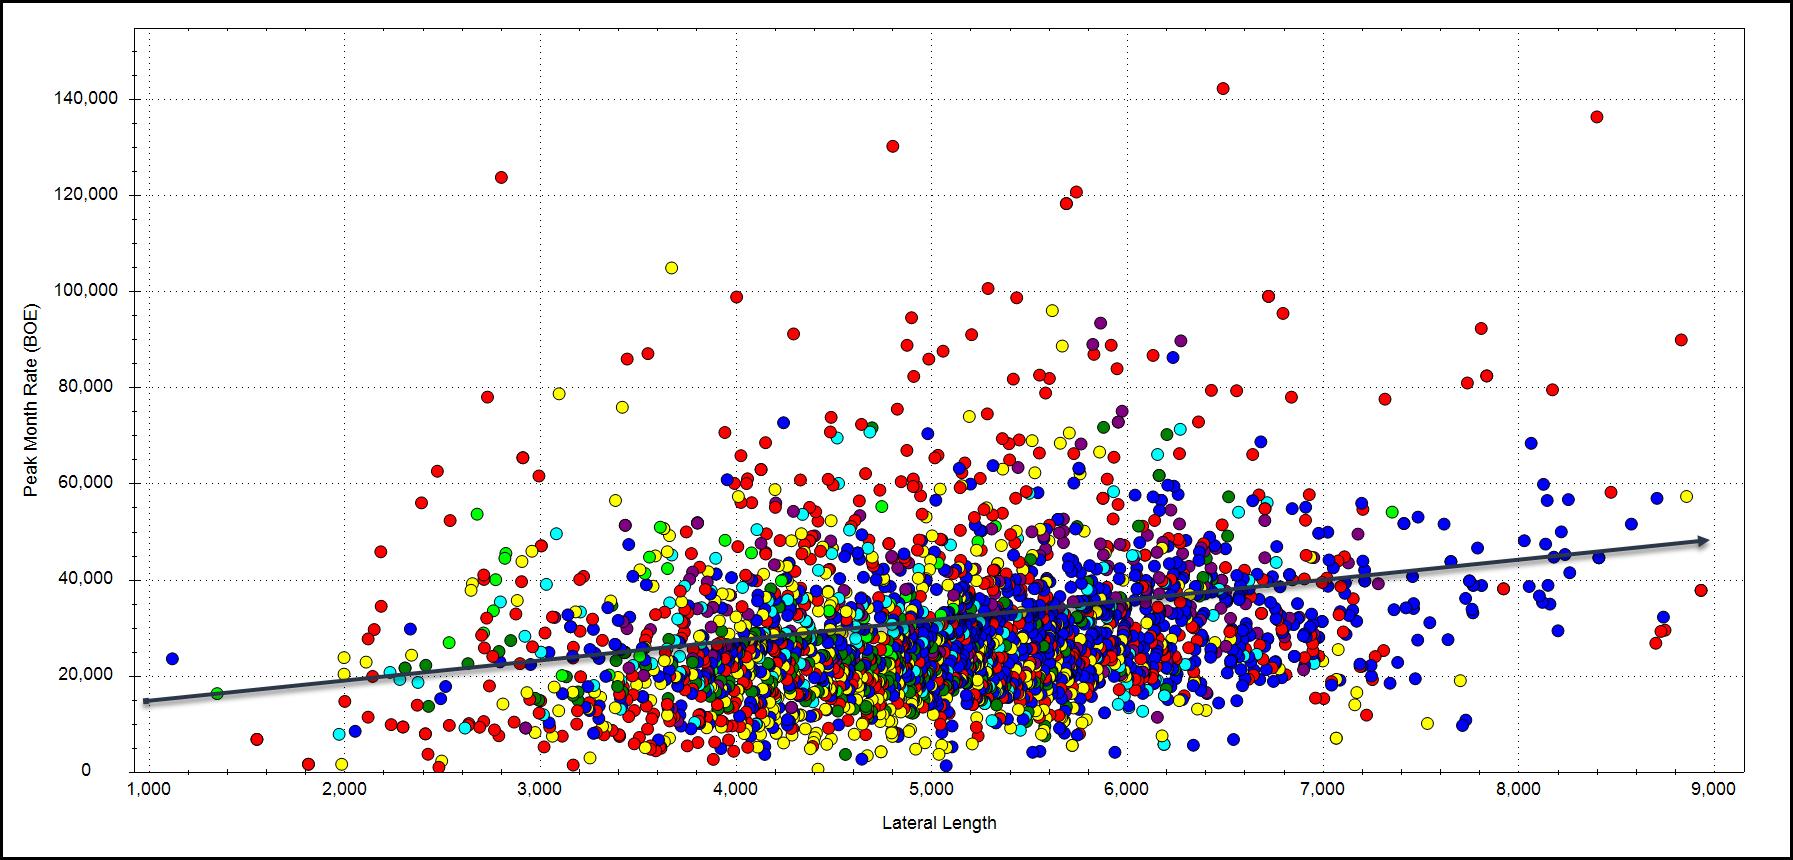 CORRECT Lat Length vs Peak Month (004)